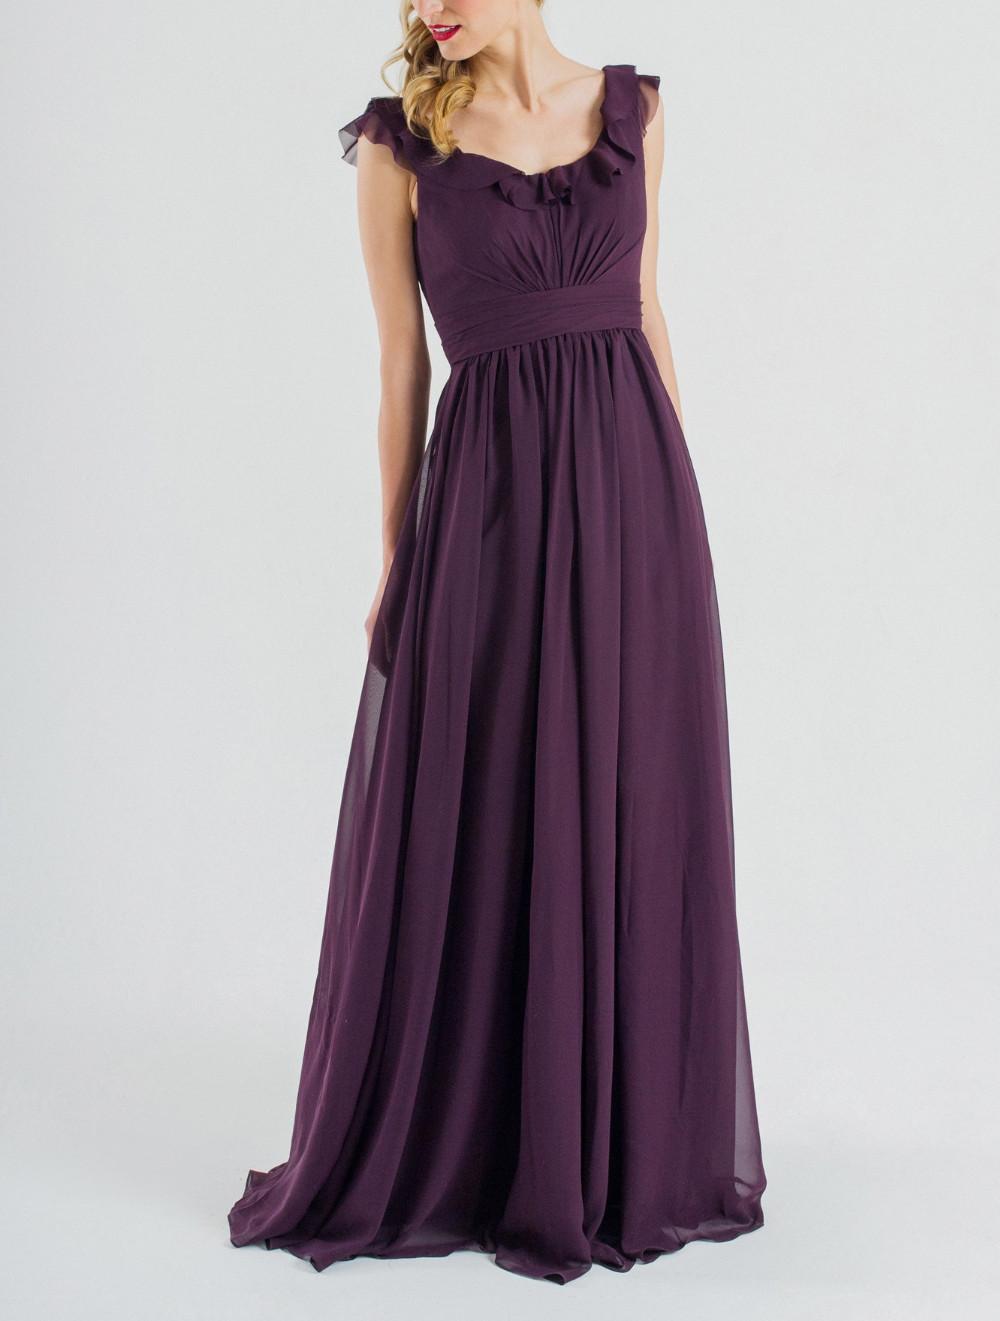 2016 elegant cheap purple scoop neck bridesmaid dresses for Wedding party dresses cheap